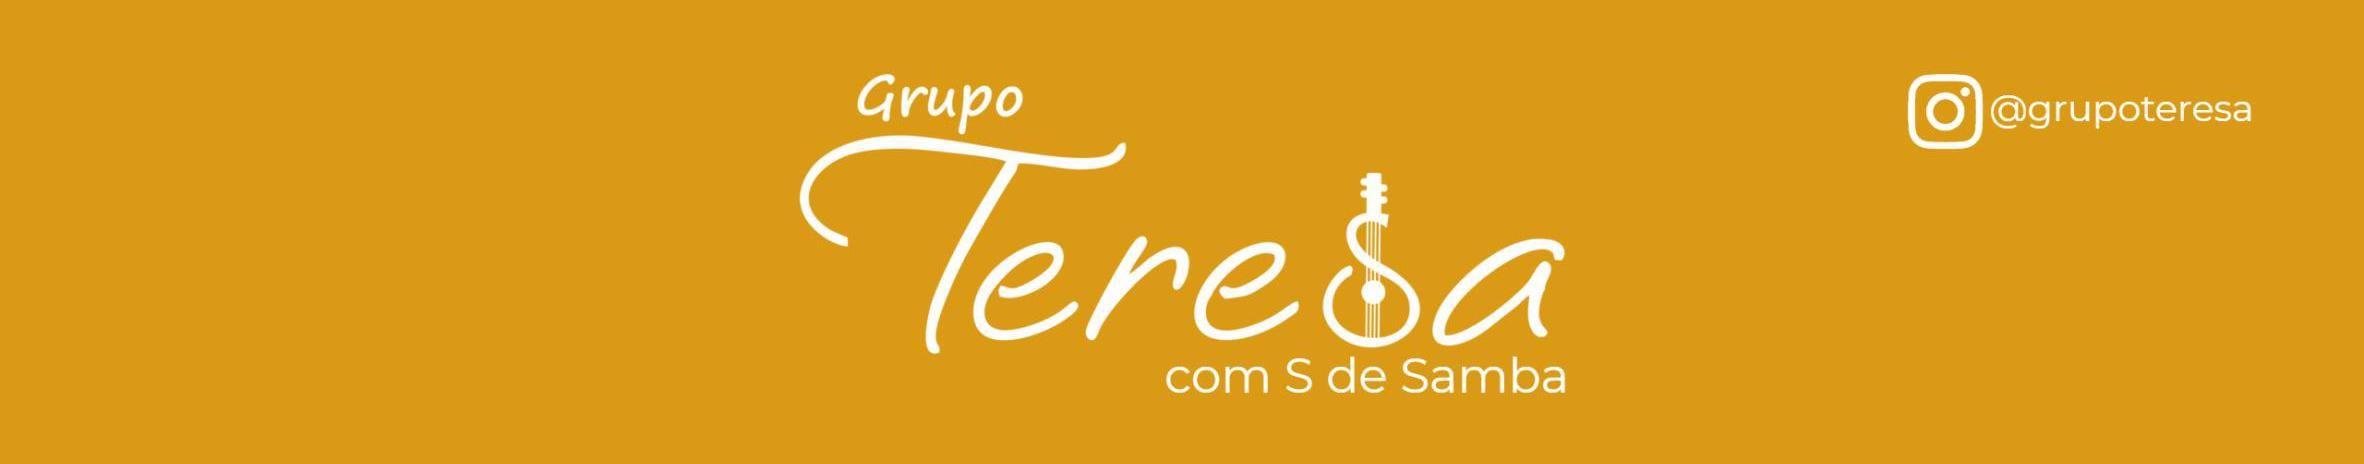 Imagem de capa de Grupo Teresa